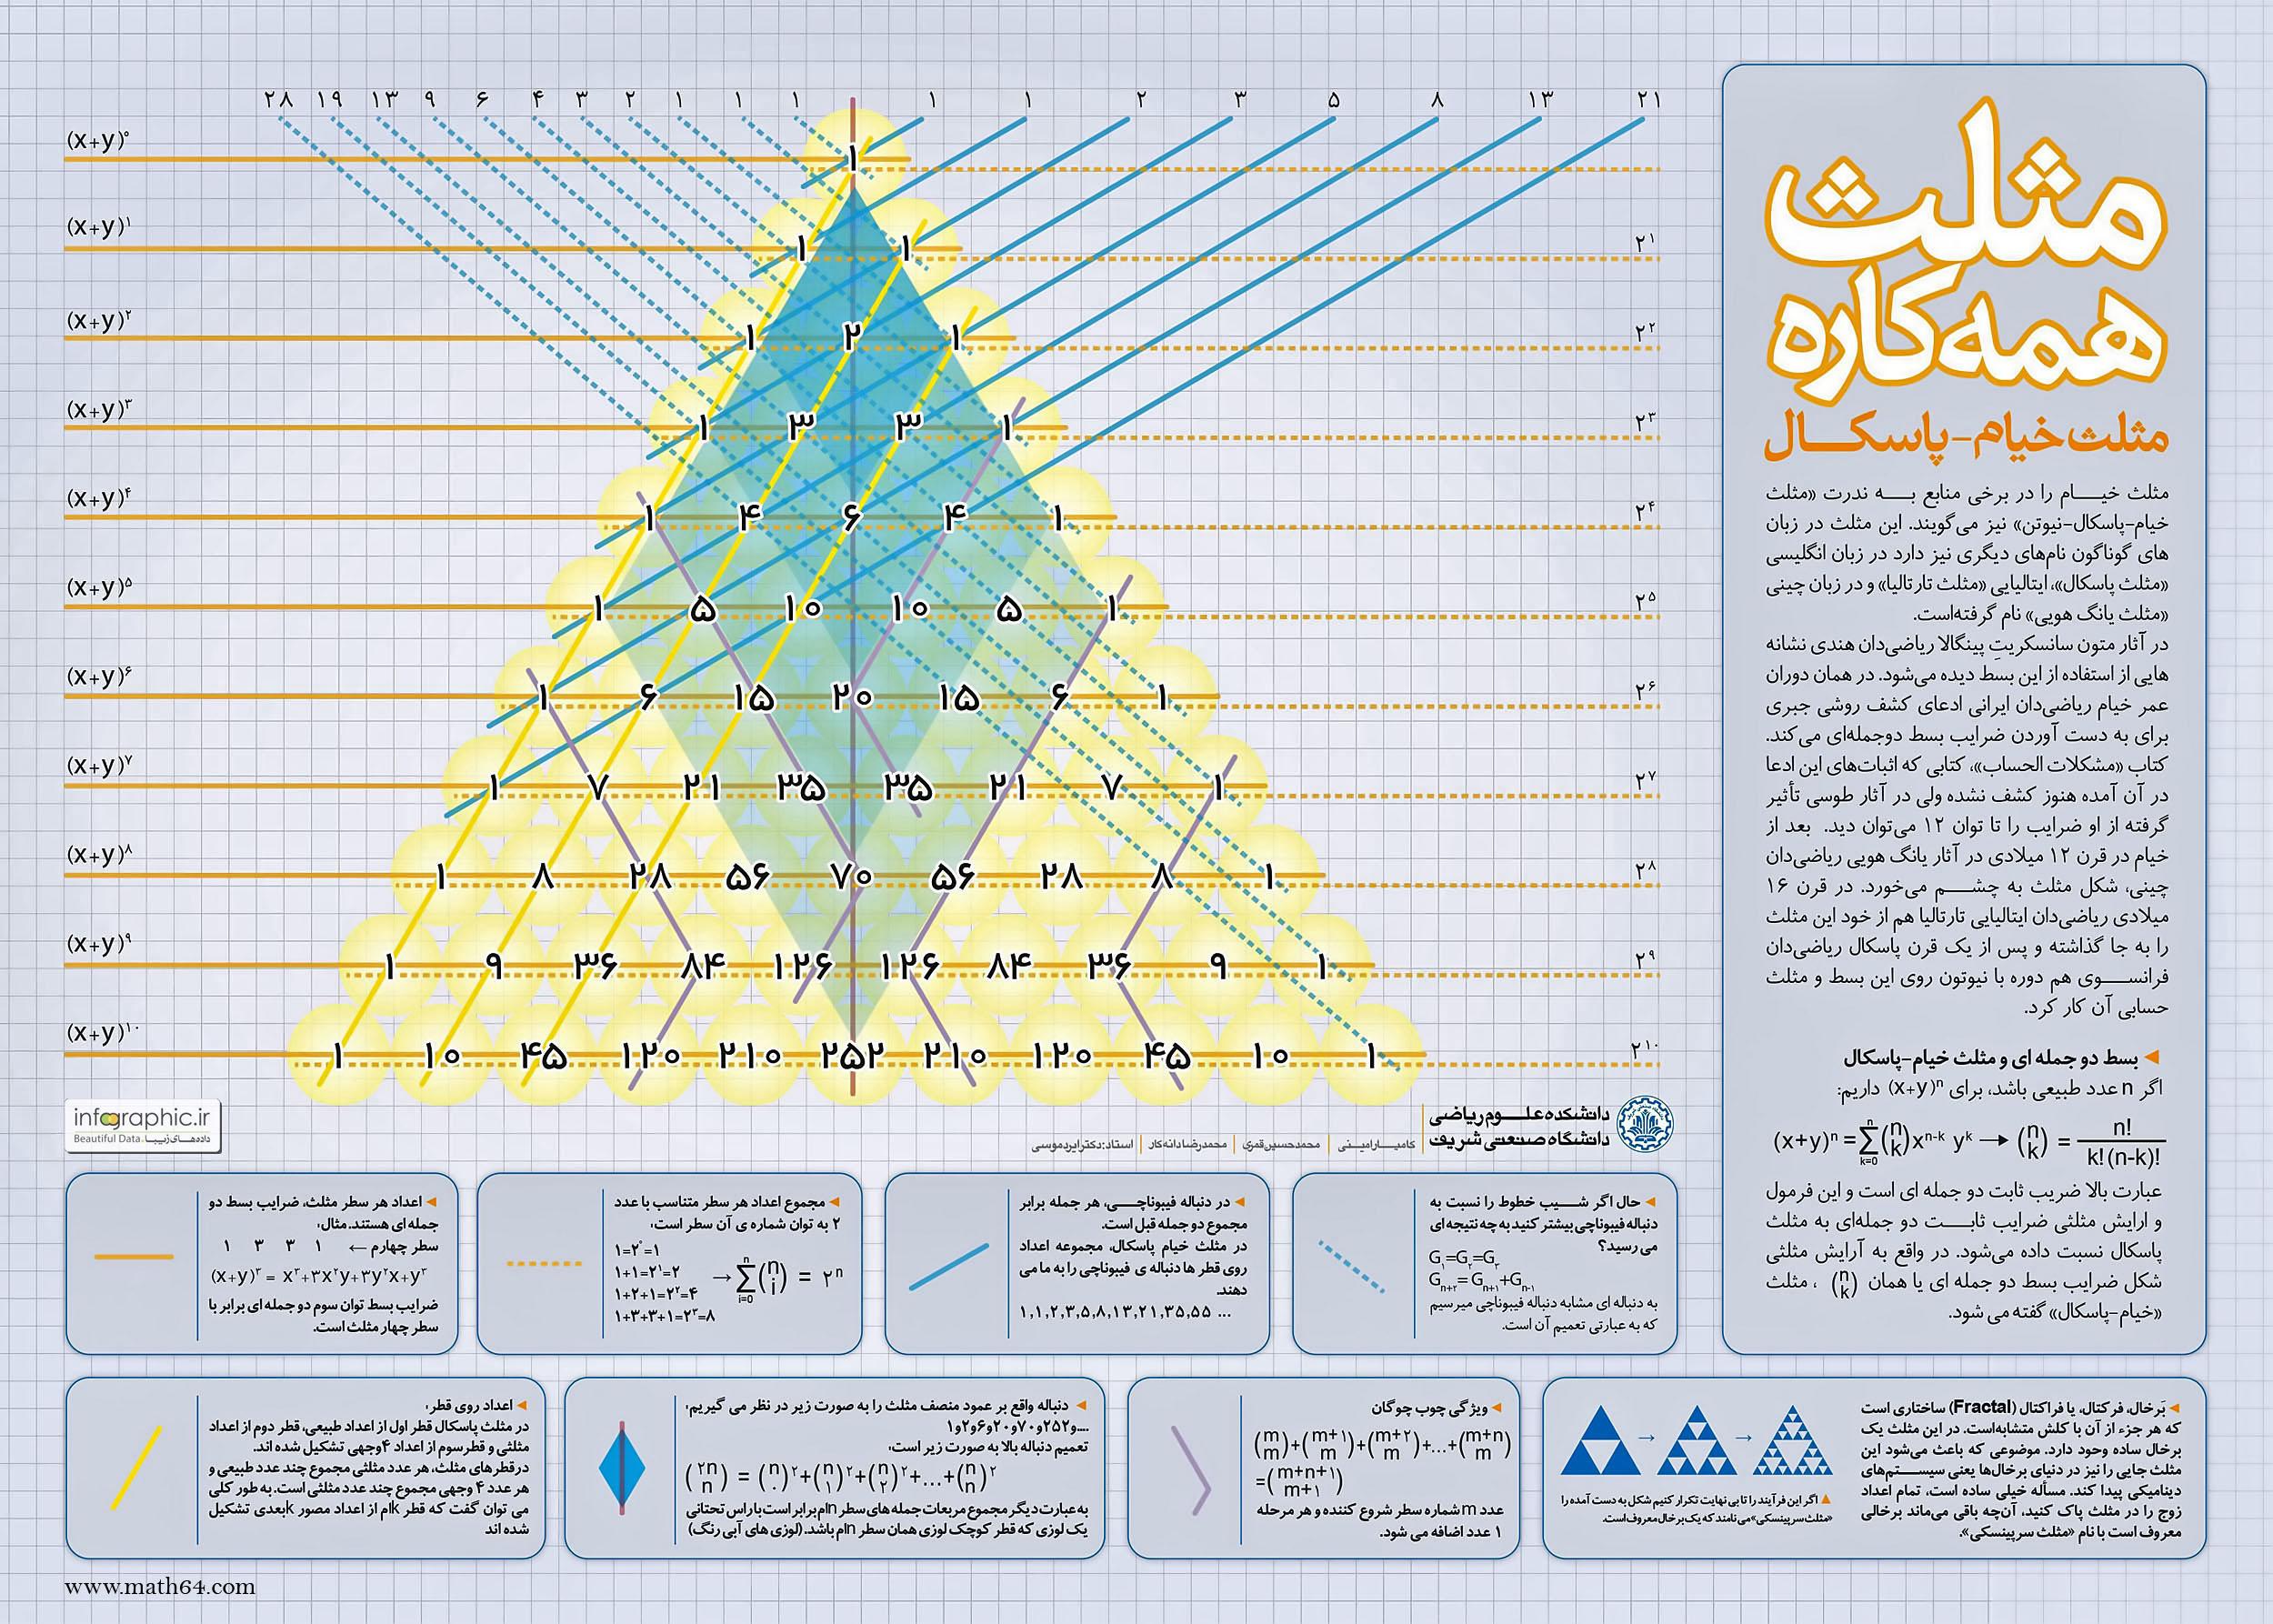 http://bayanbox.ir/view/4301438067860596189/Binomial-math64-com.jpg